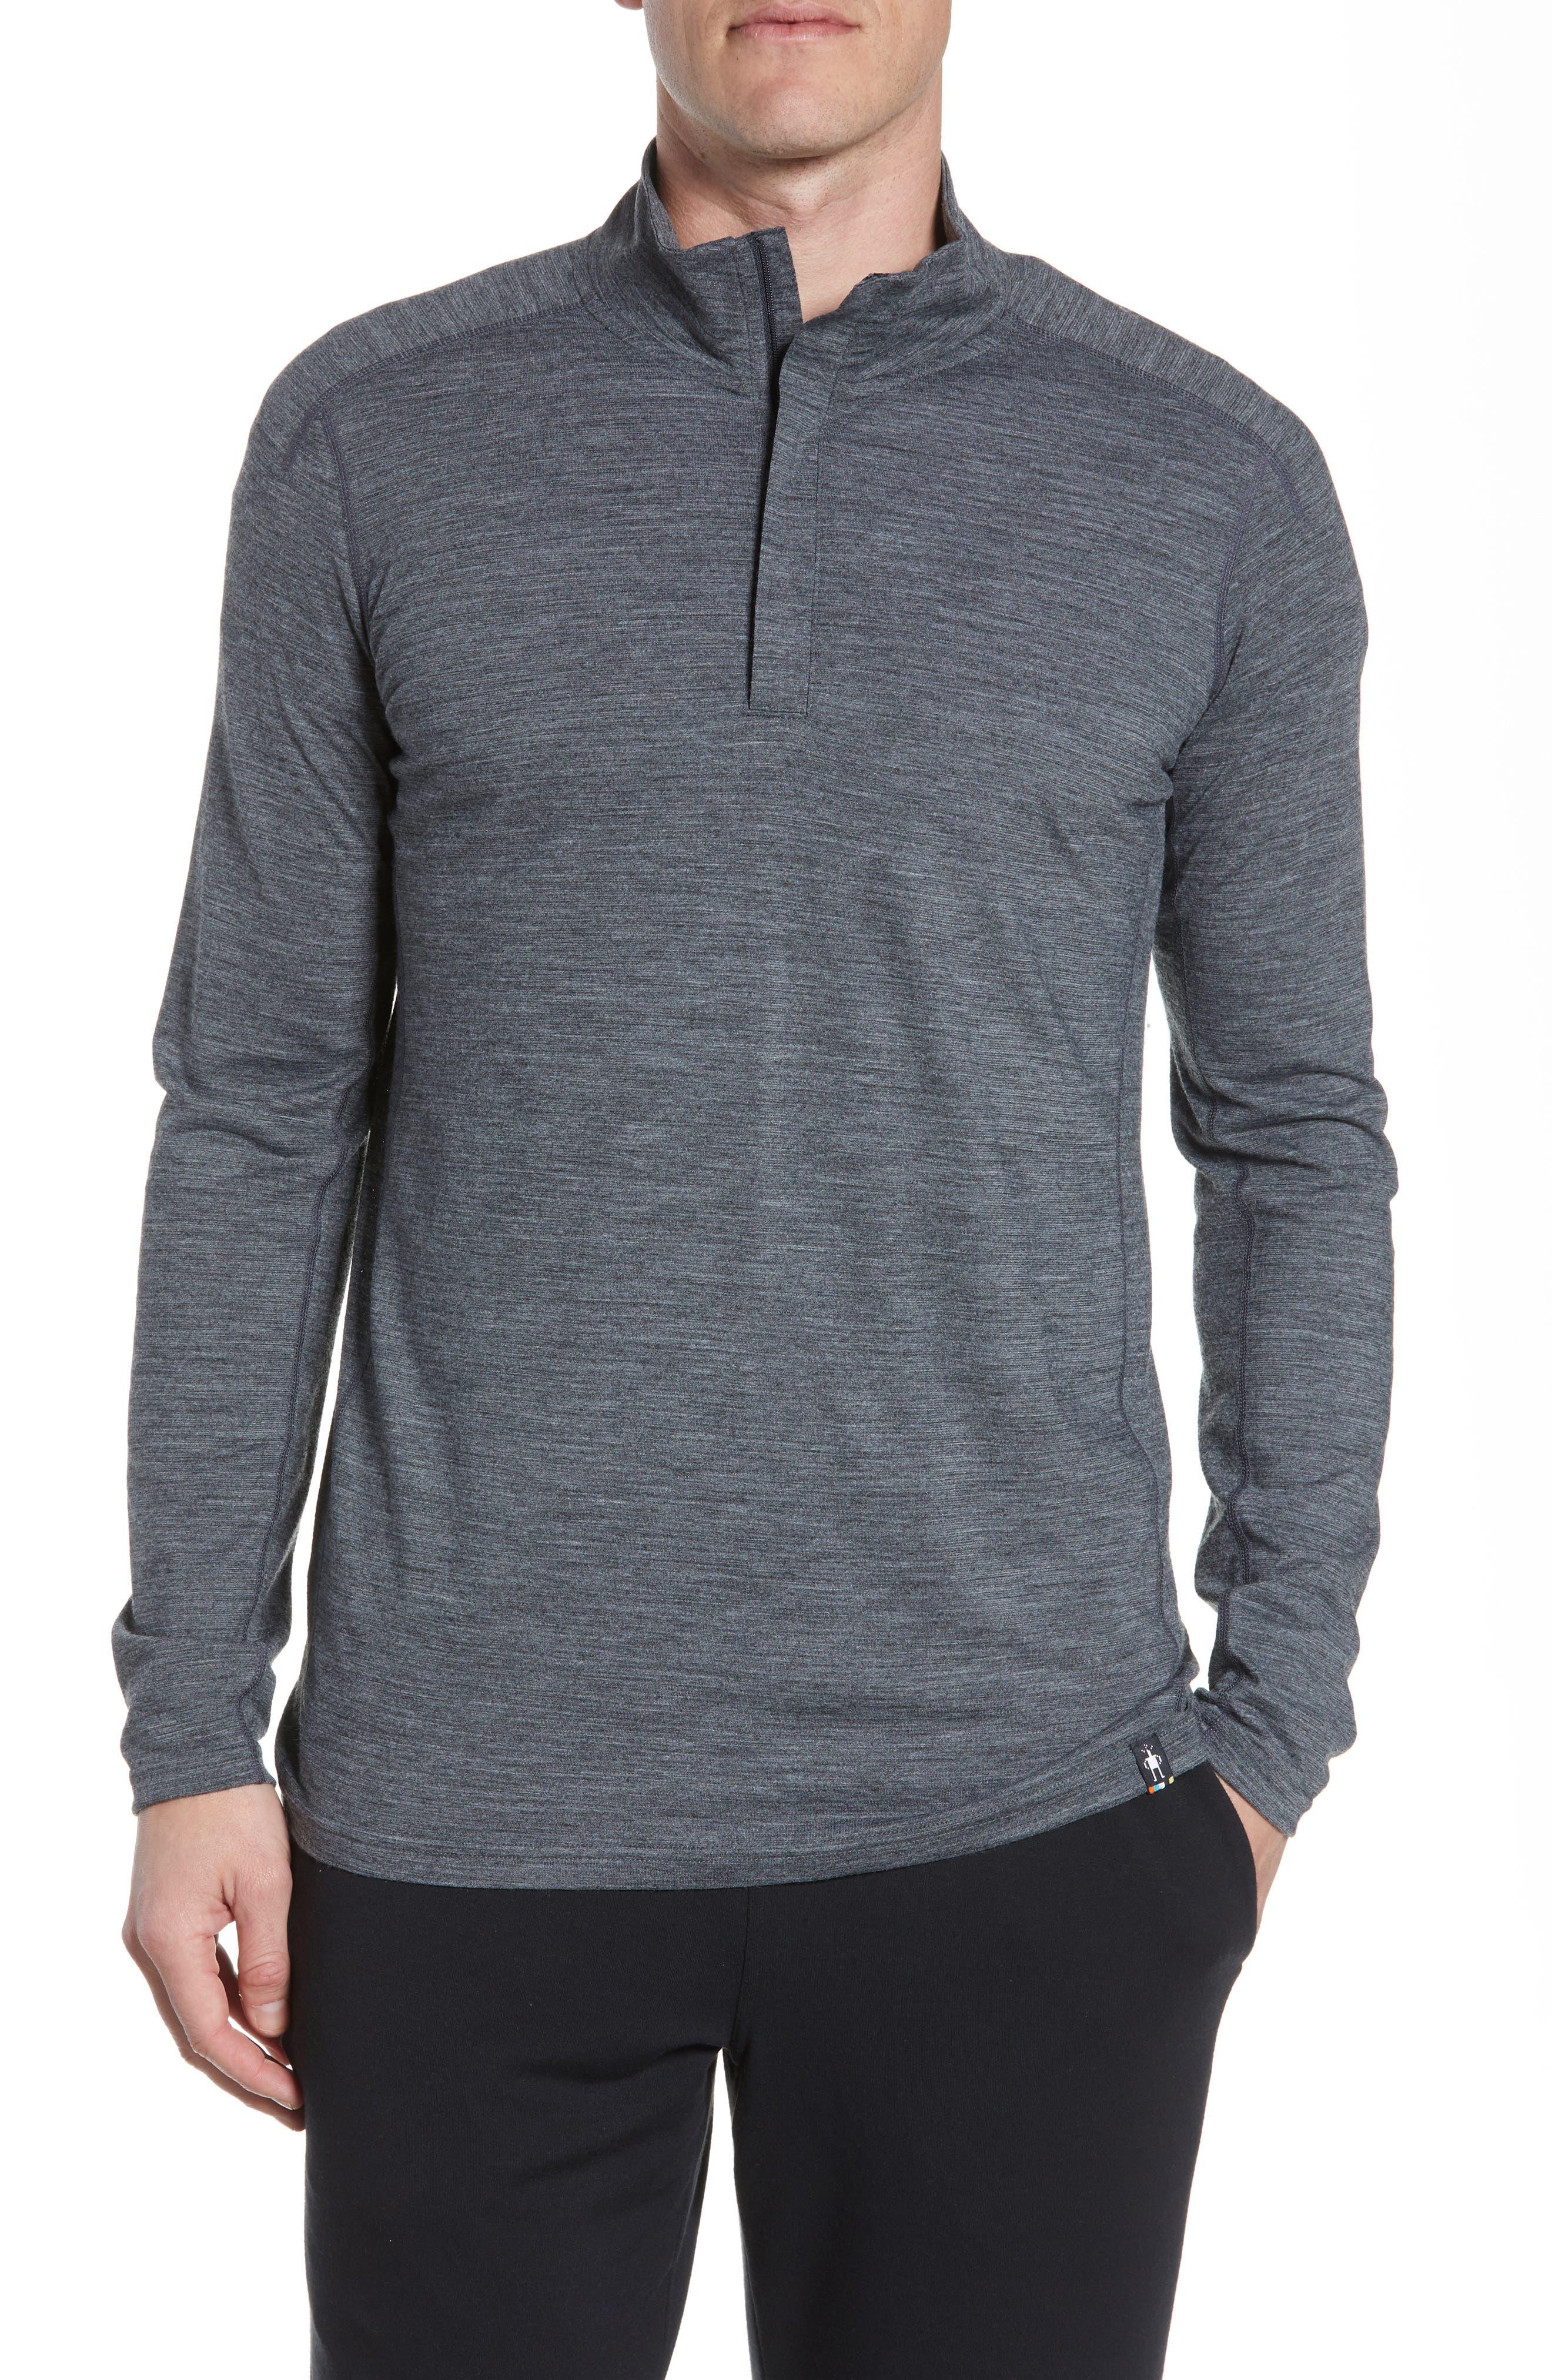 Smartwool Quarter Zip Merino Blend Pullover, Grey